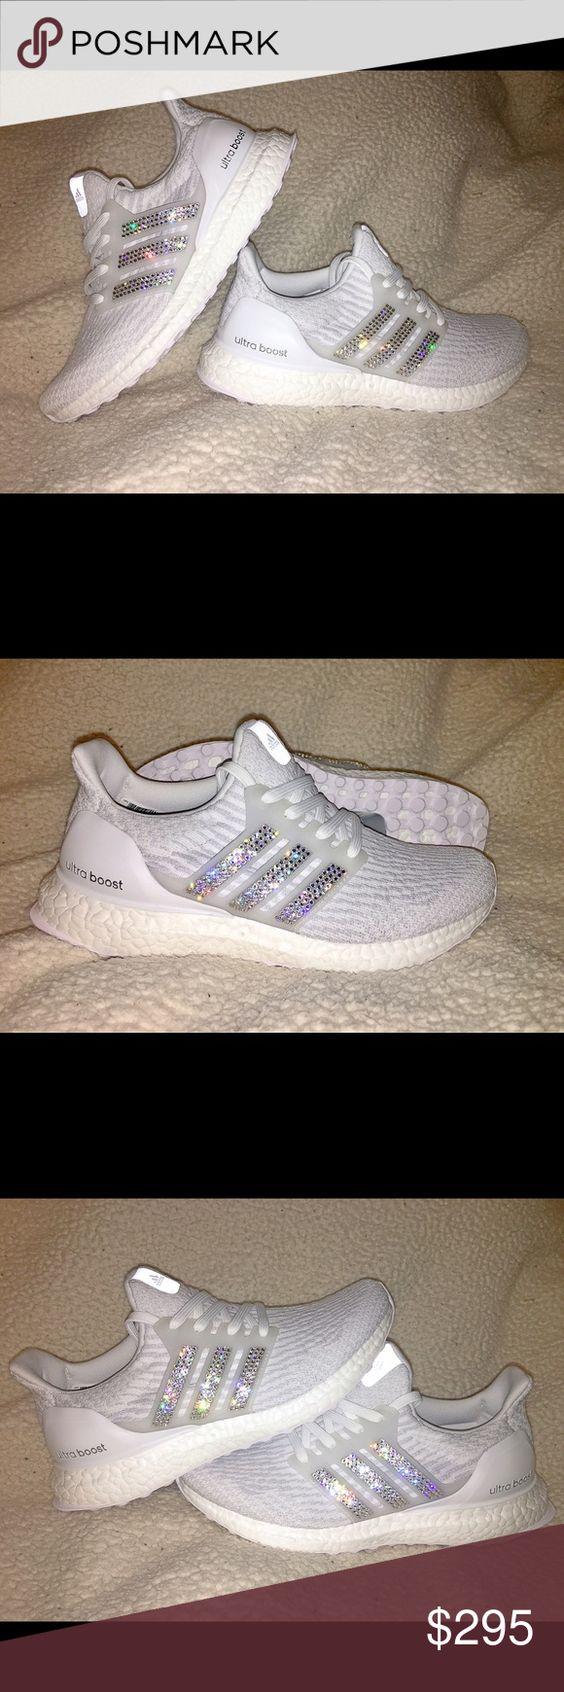 new adidas stan smith,adipower black >off70% originali scarpe